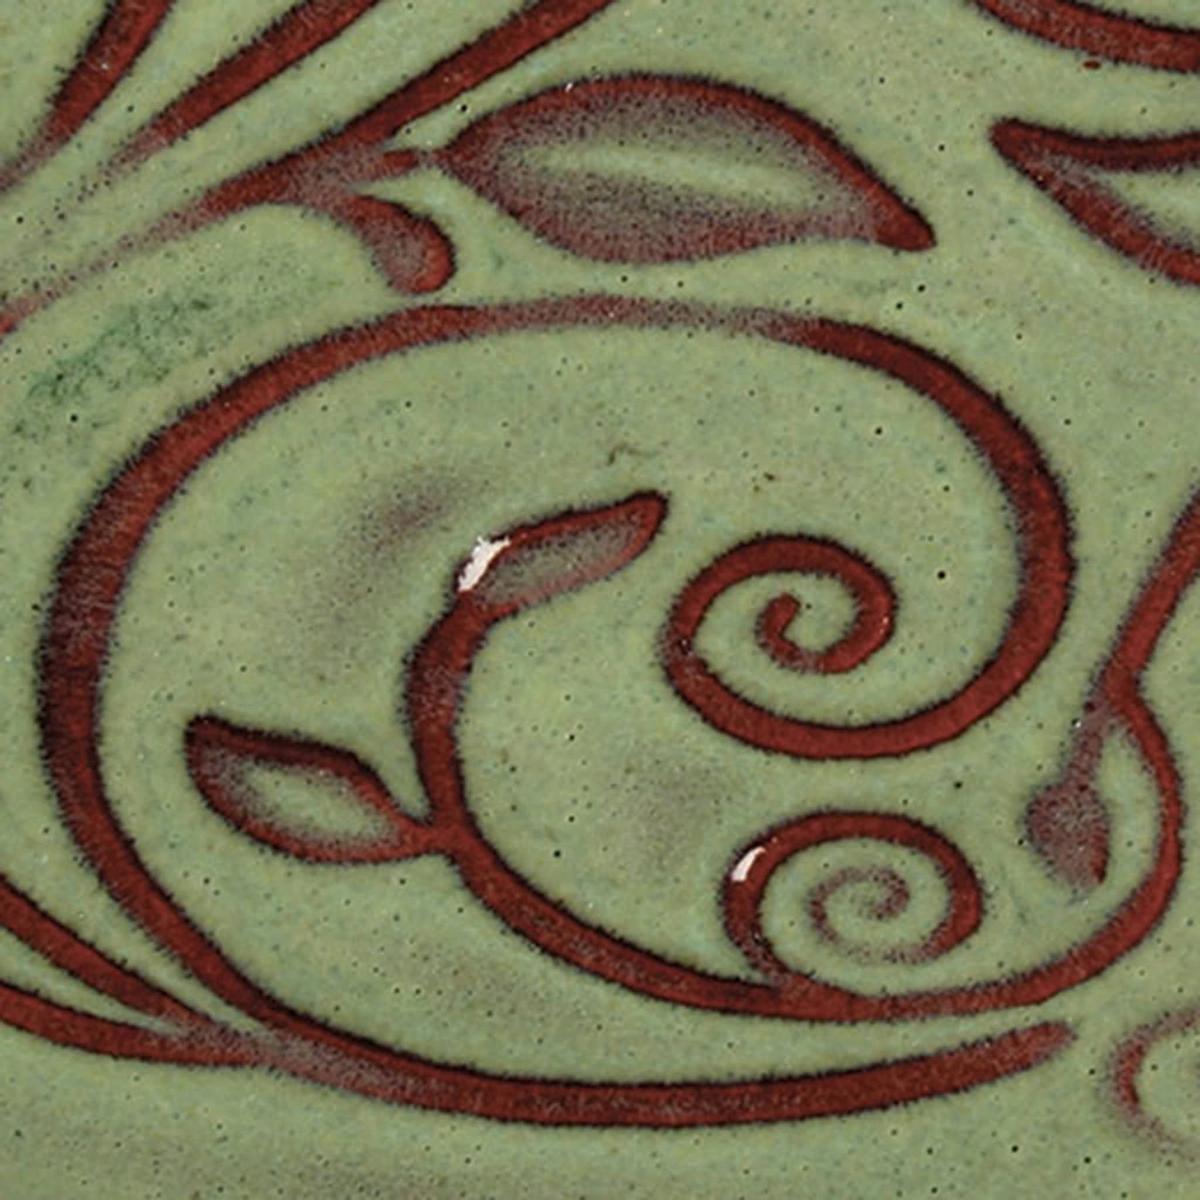 venta de esmalte para cerámica amaco opalenscent O-42 moss green baja temperatura